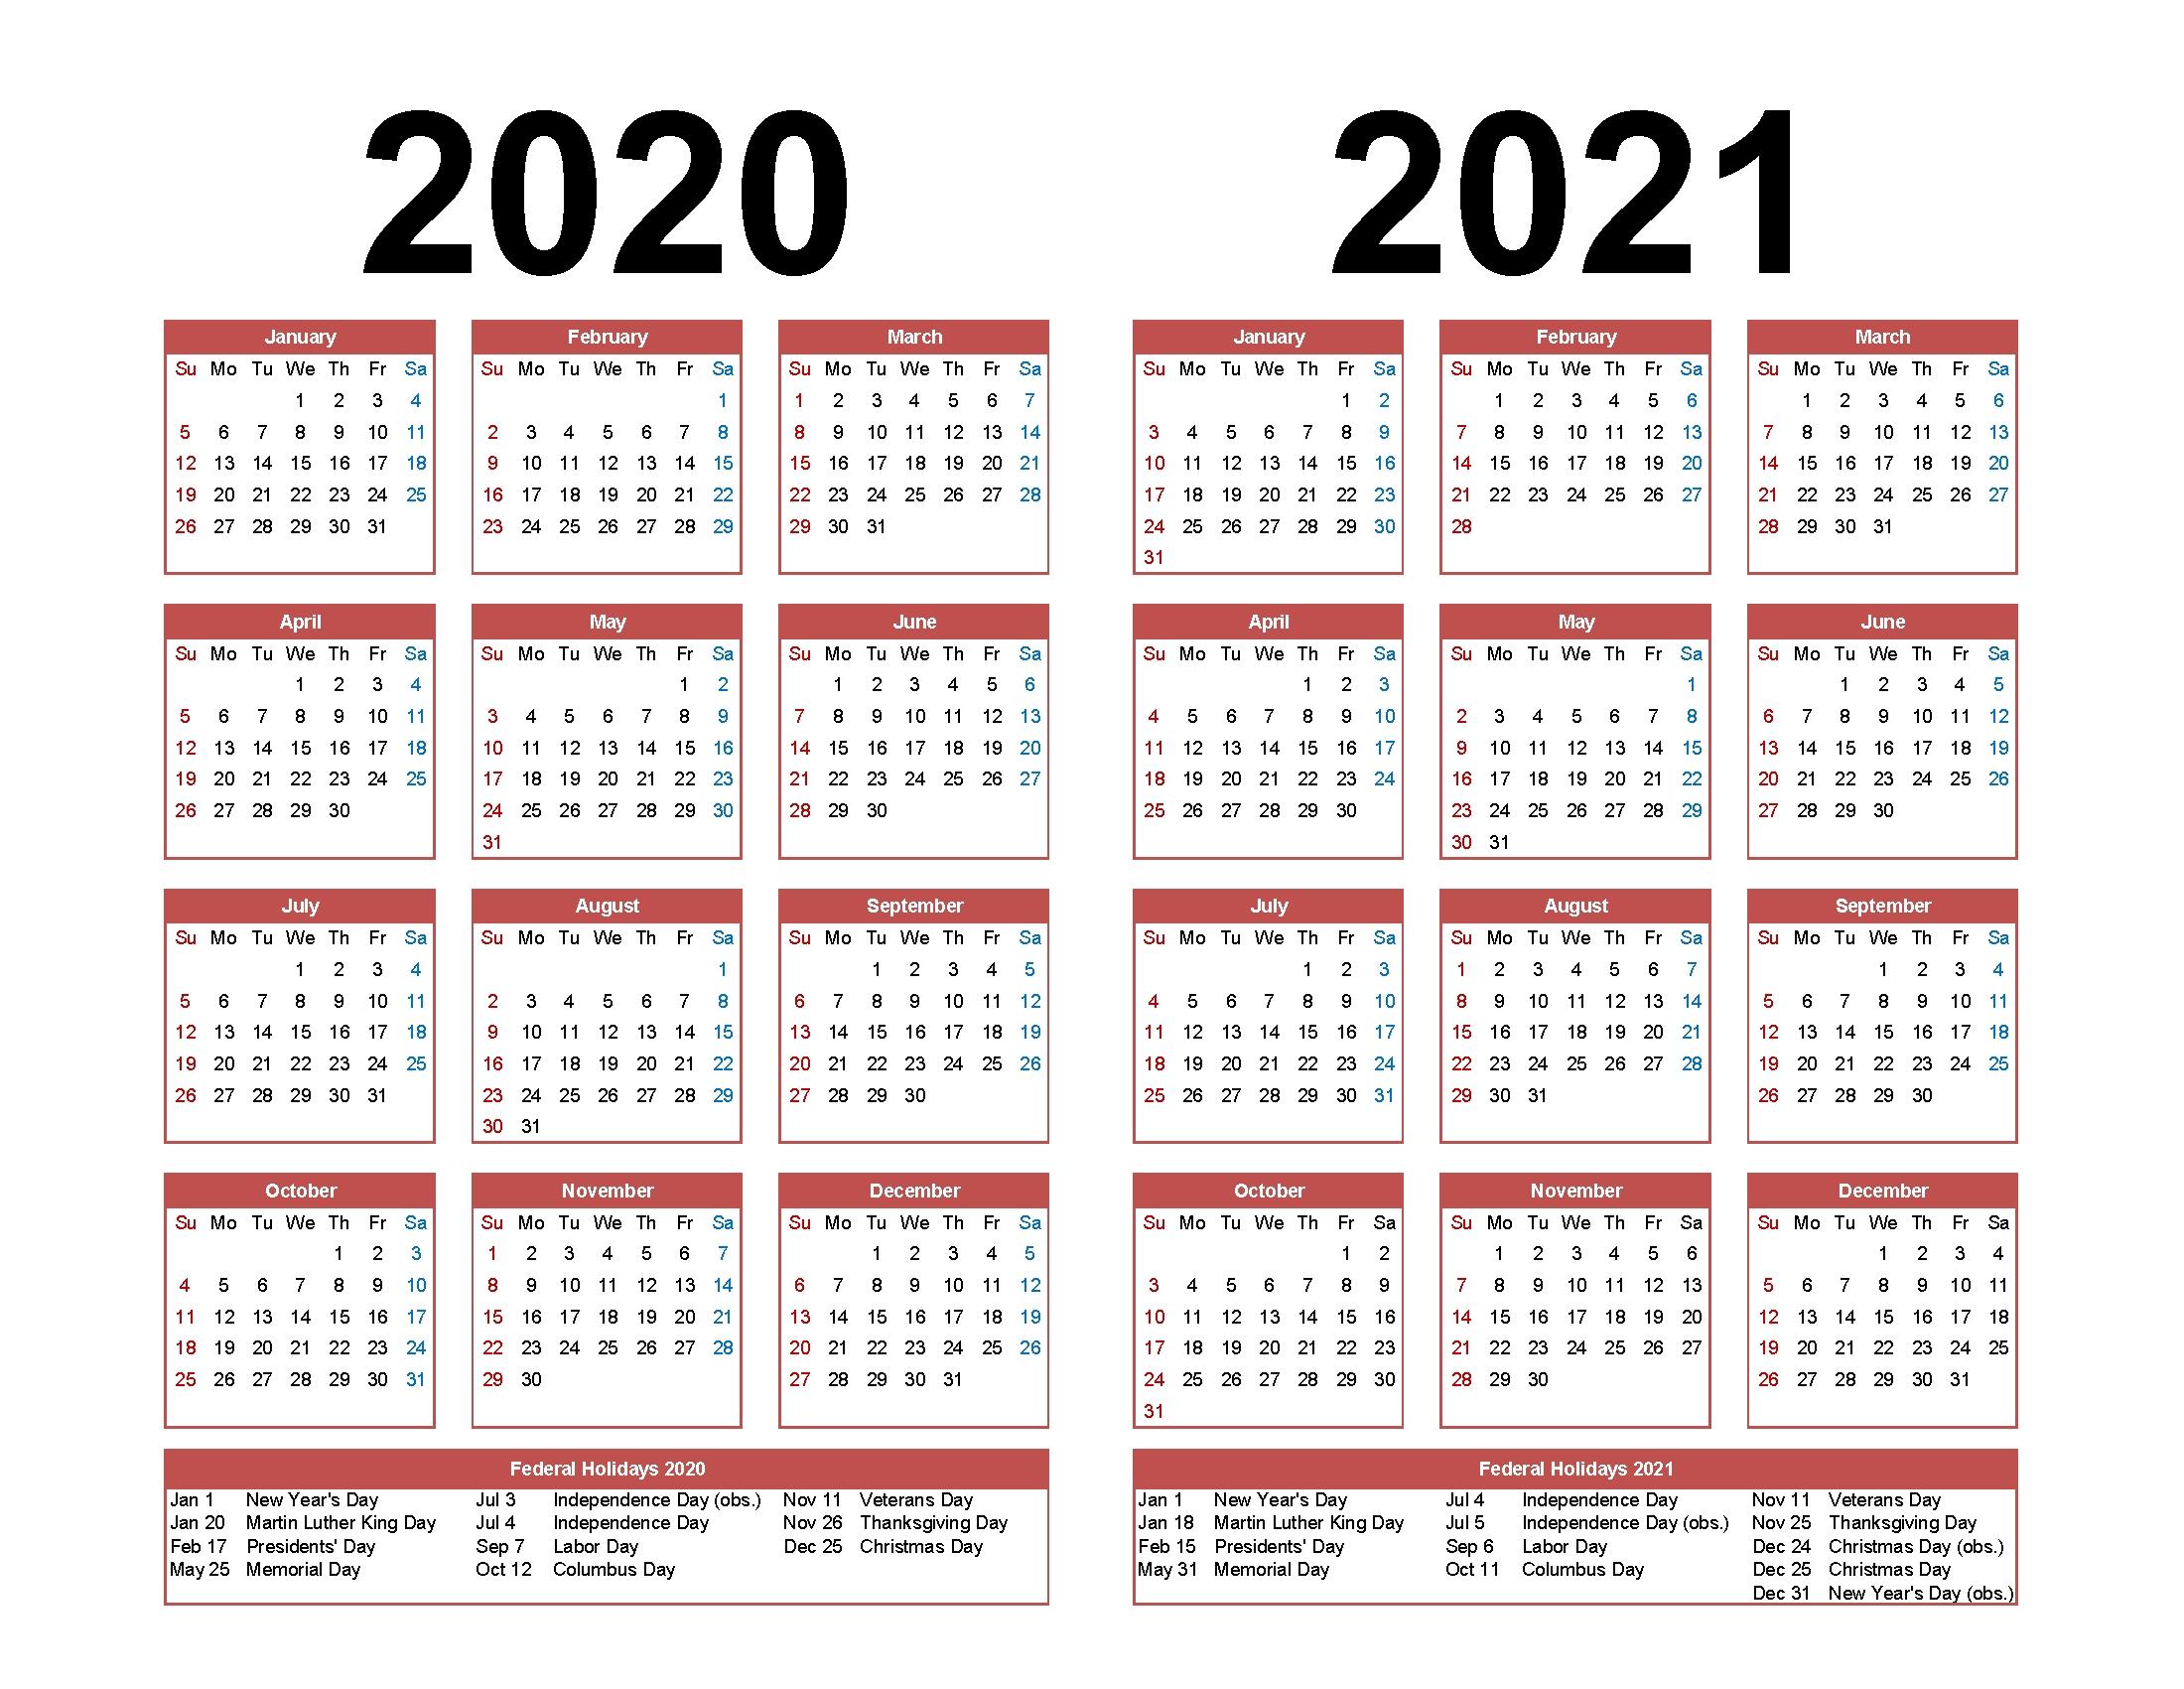 Take Employee Calendar 2020 | Calendar Printables Free Blank